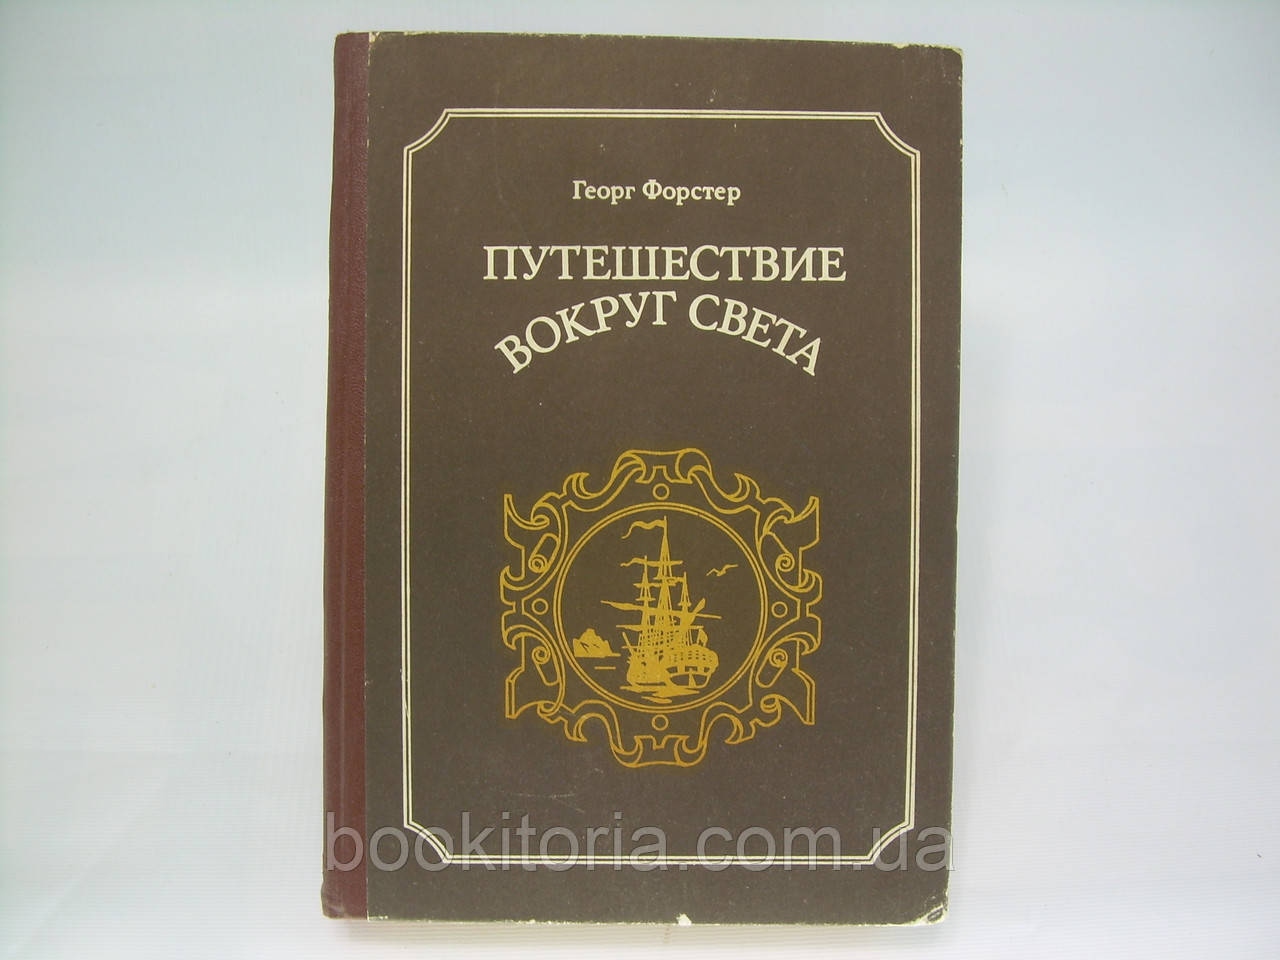 Форстер Г. Путешествие вокруг света (б/у).